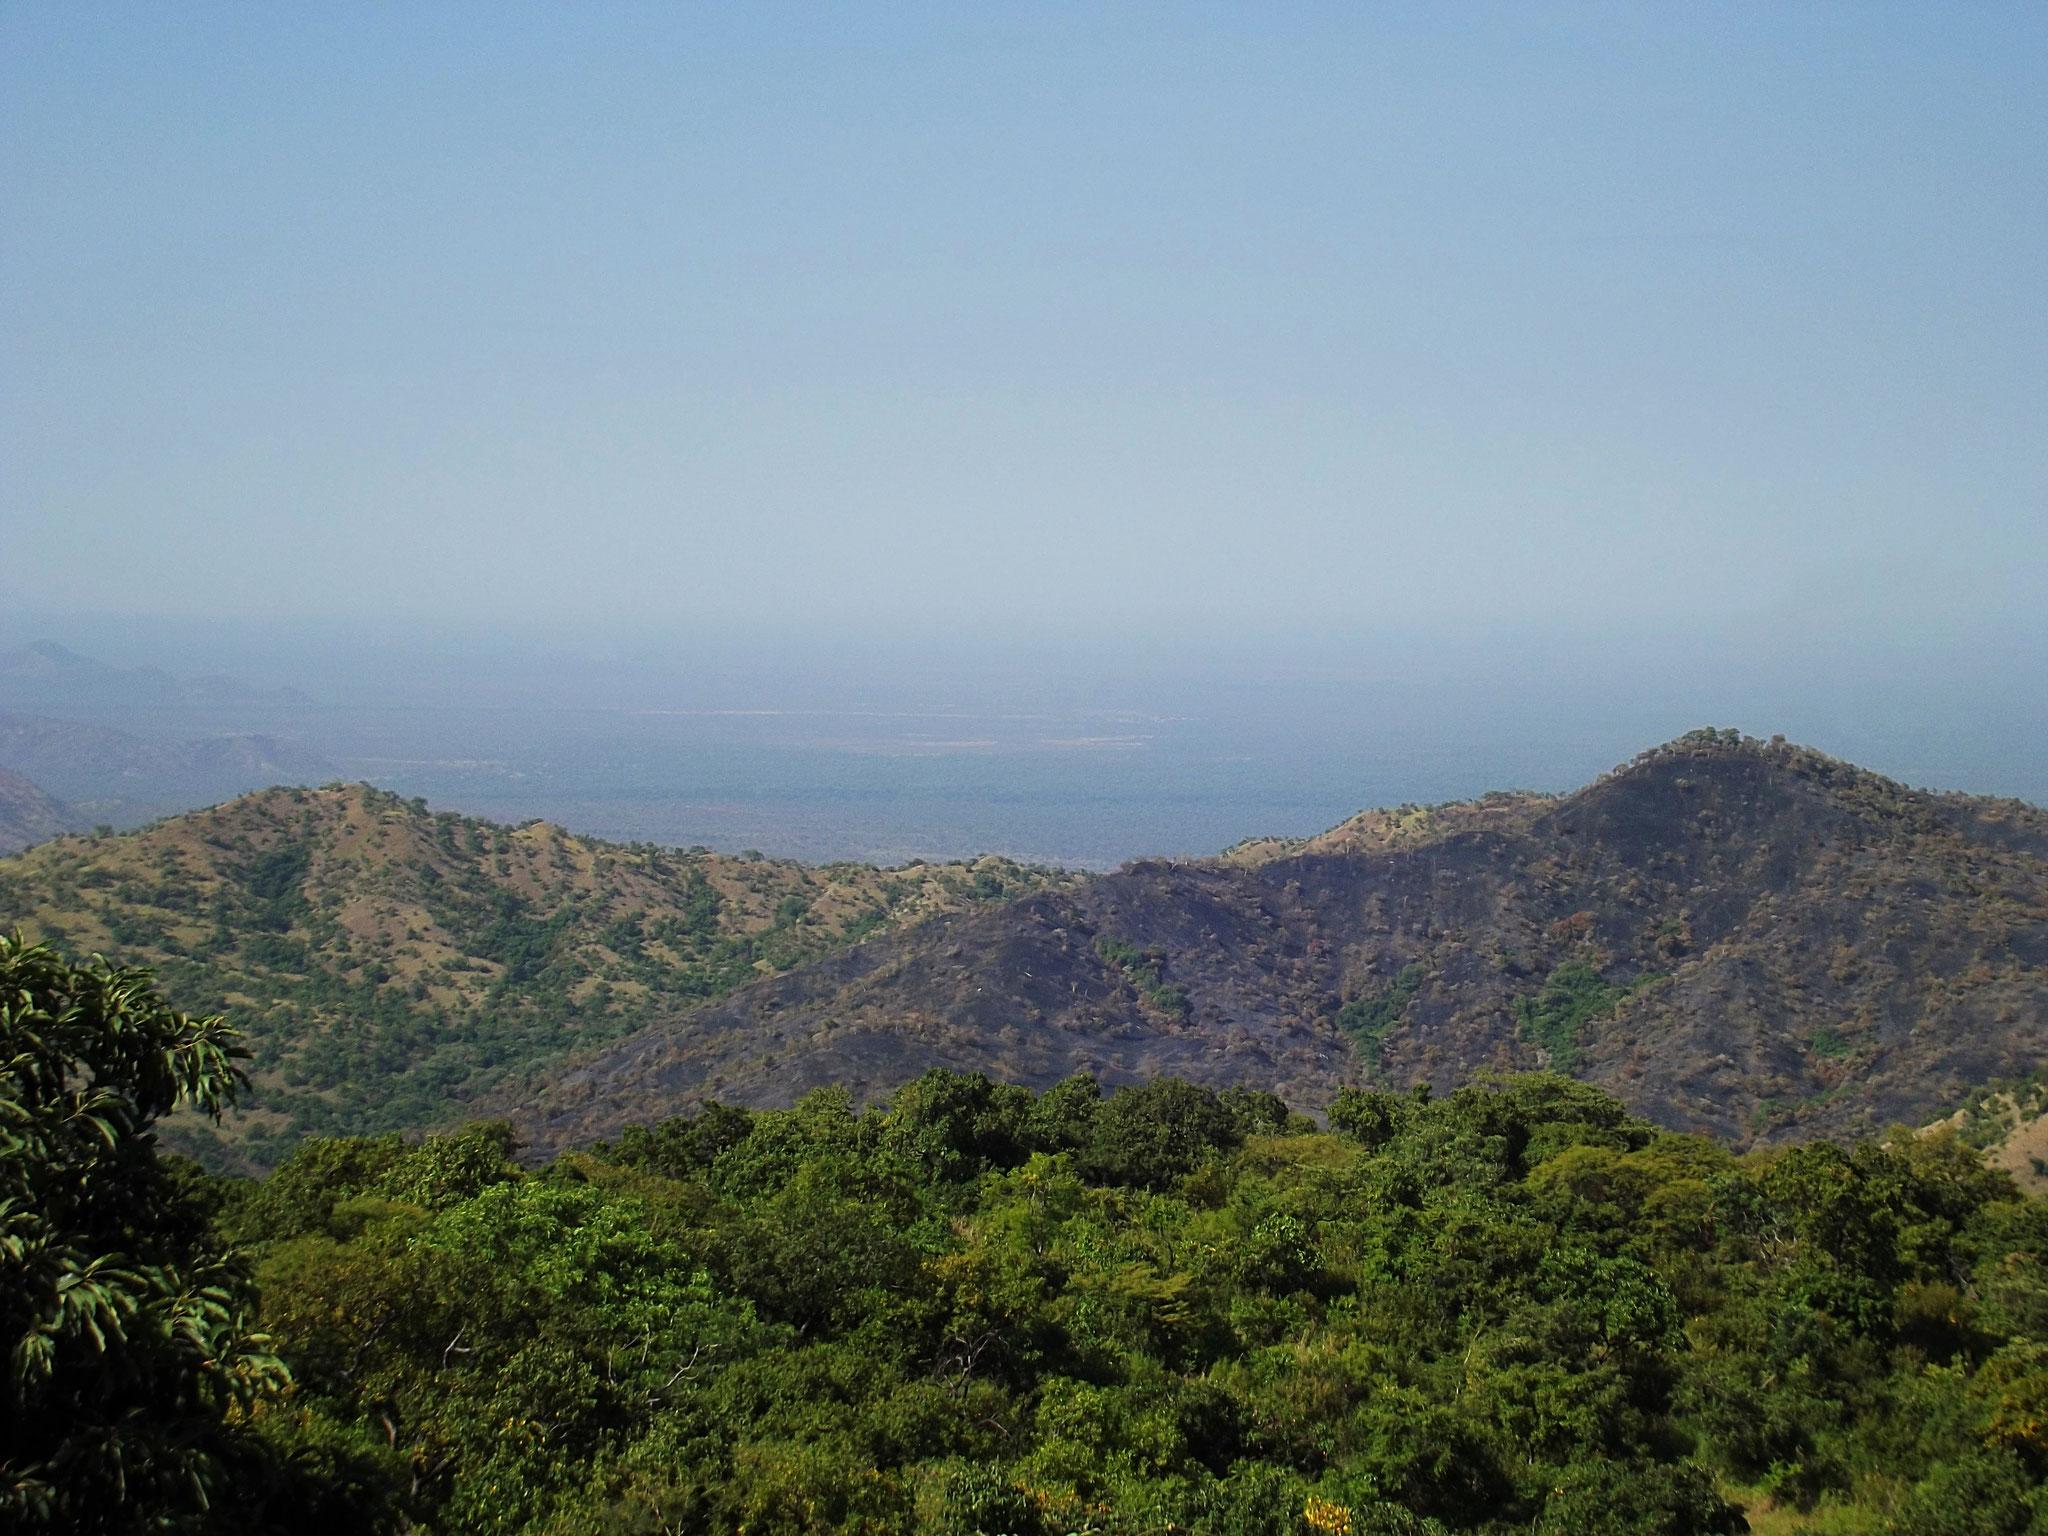 Voyage Séjour Trek Trekking Randonnée Road Trip en Ethiopie Visite de la Vallée de l'Omo en Ethiopie